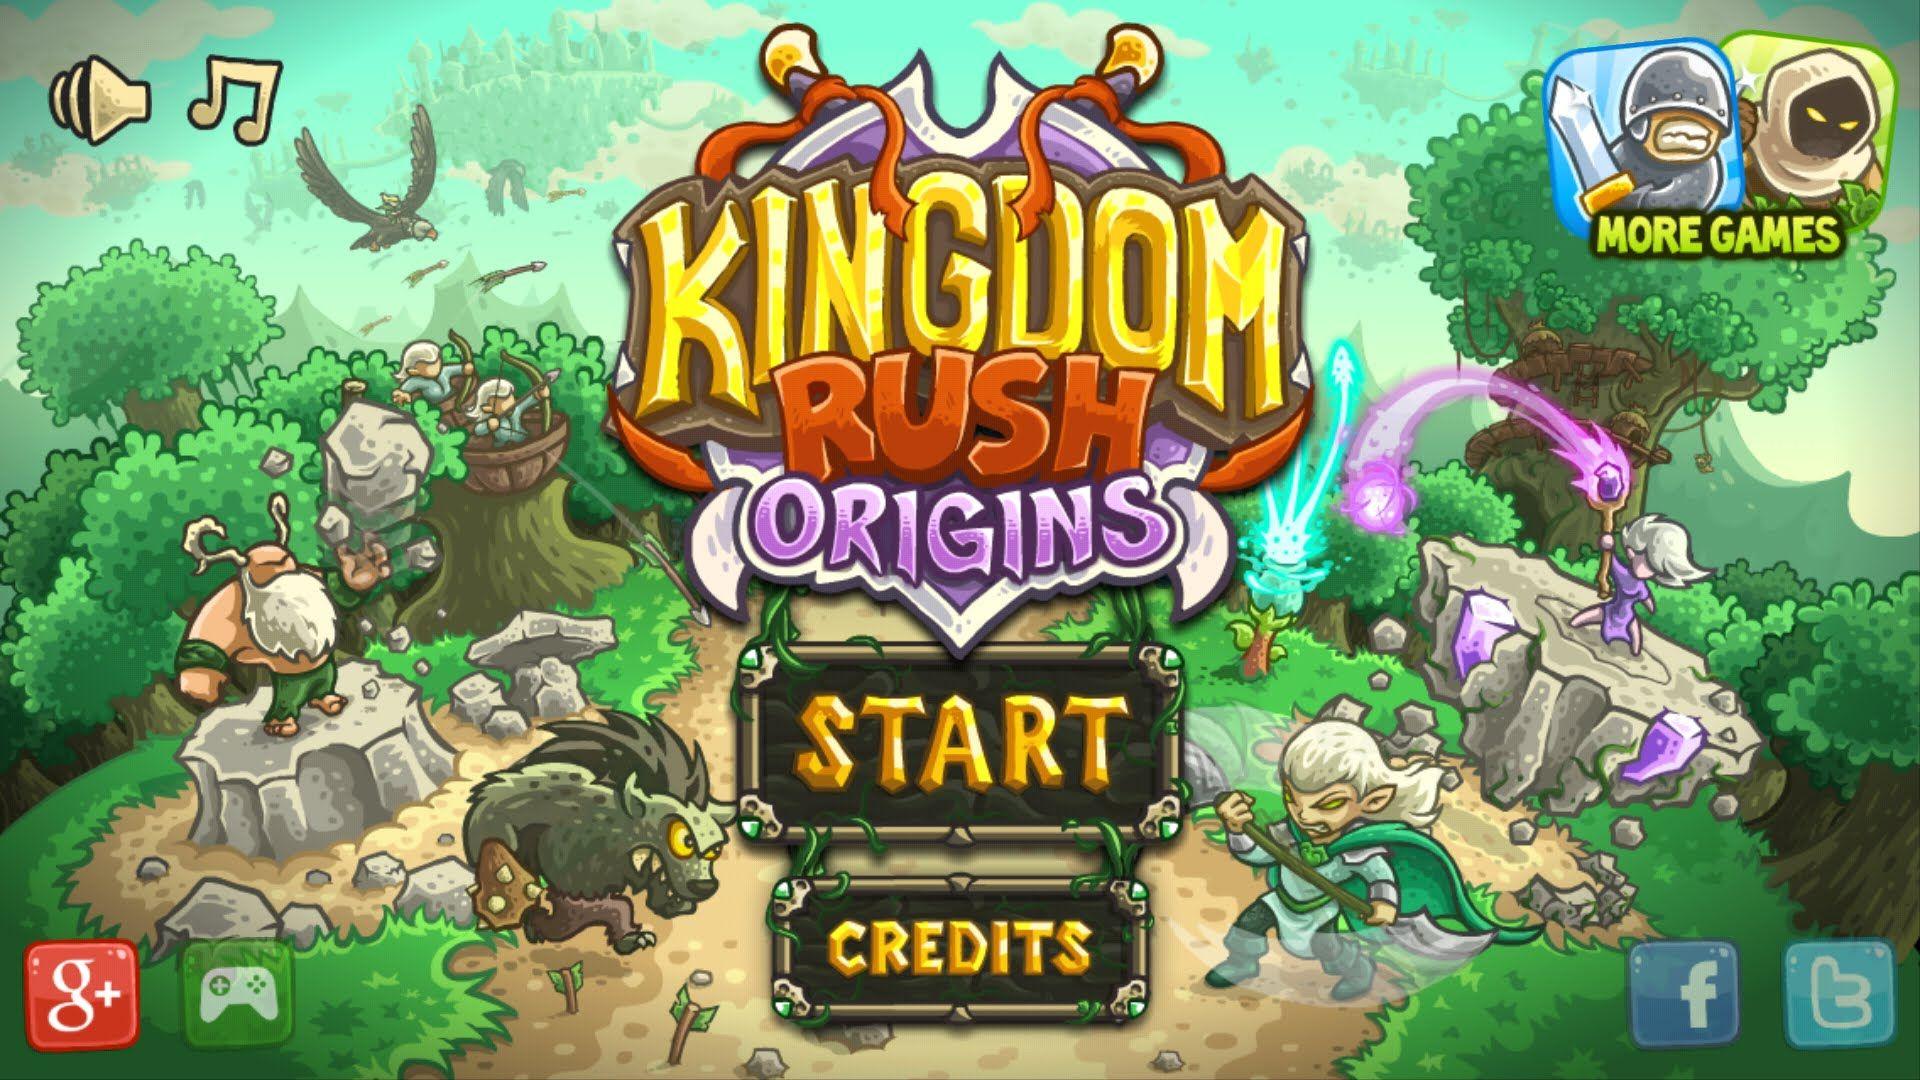 Kingdom rush 3 скачать на | dodate | The originals, Defense